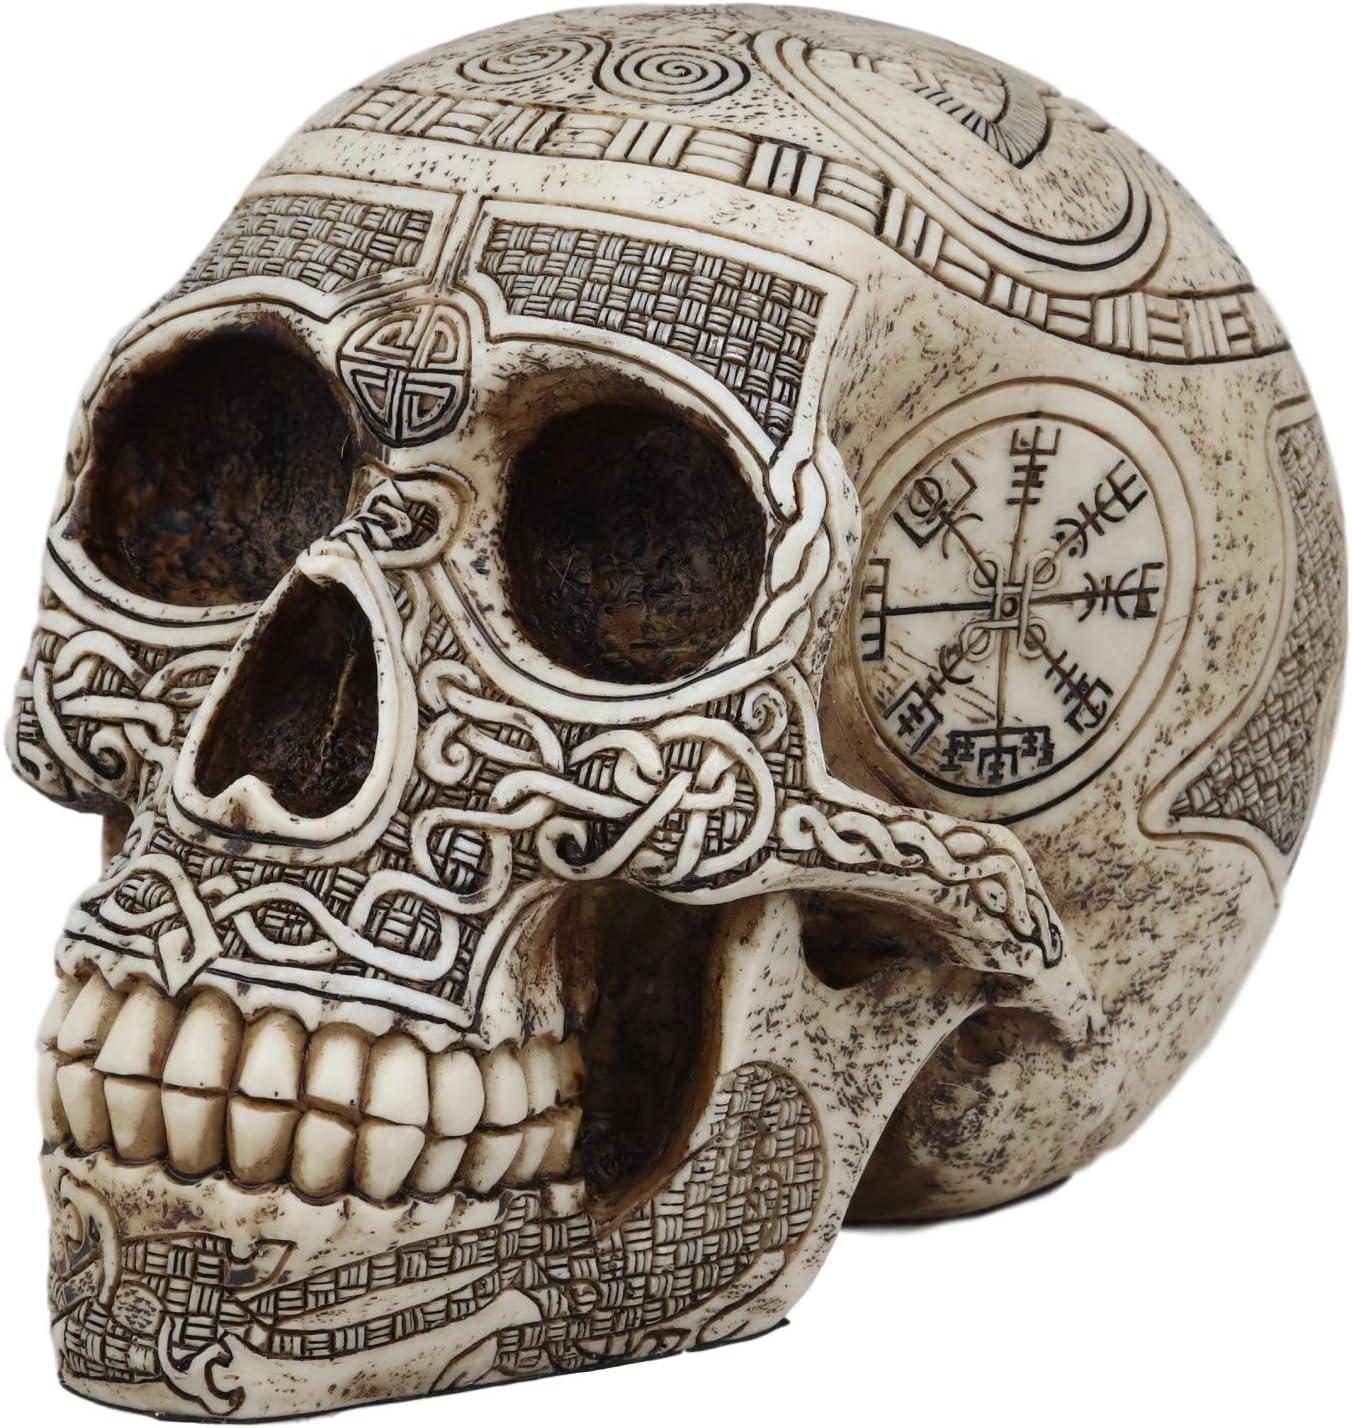 "Ebros Norse Mythology Viking Vegvisir Compass Talisman with Trinity Valknut Odin Skull Figurine 8"" Long Skeleton Head Skulls Ossuary Graveyard Macabre Halloween Decor"